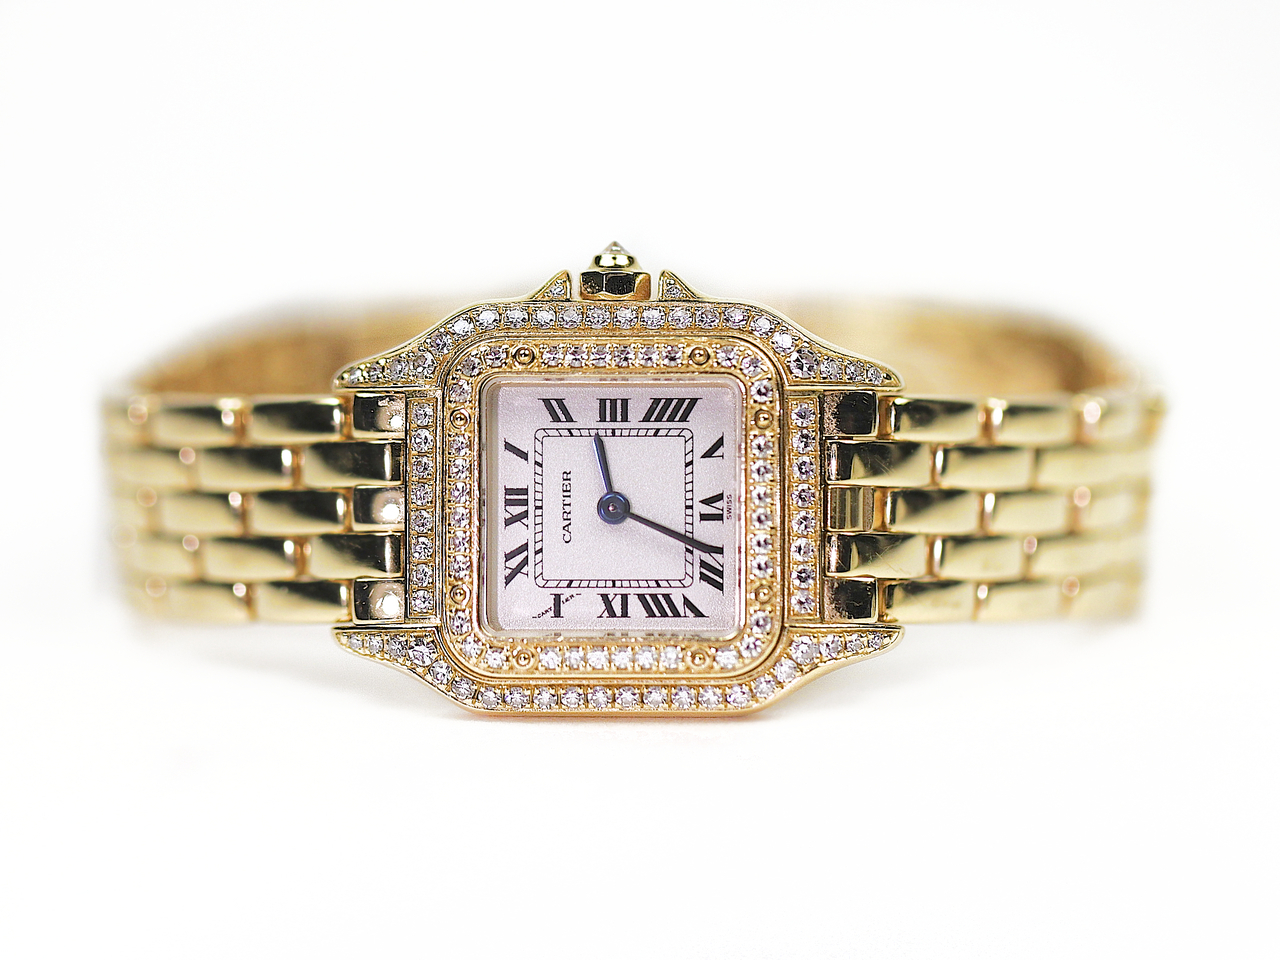 04cd865a0a4f Cartier Watch - Panther Yellow Gold Diamonds WF3072B9 used sale  www.legendoftime.com